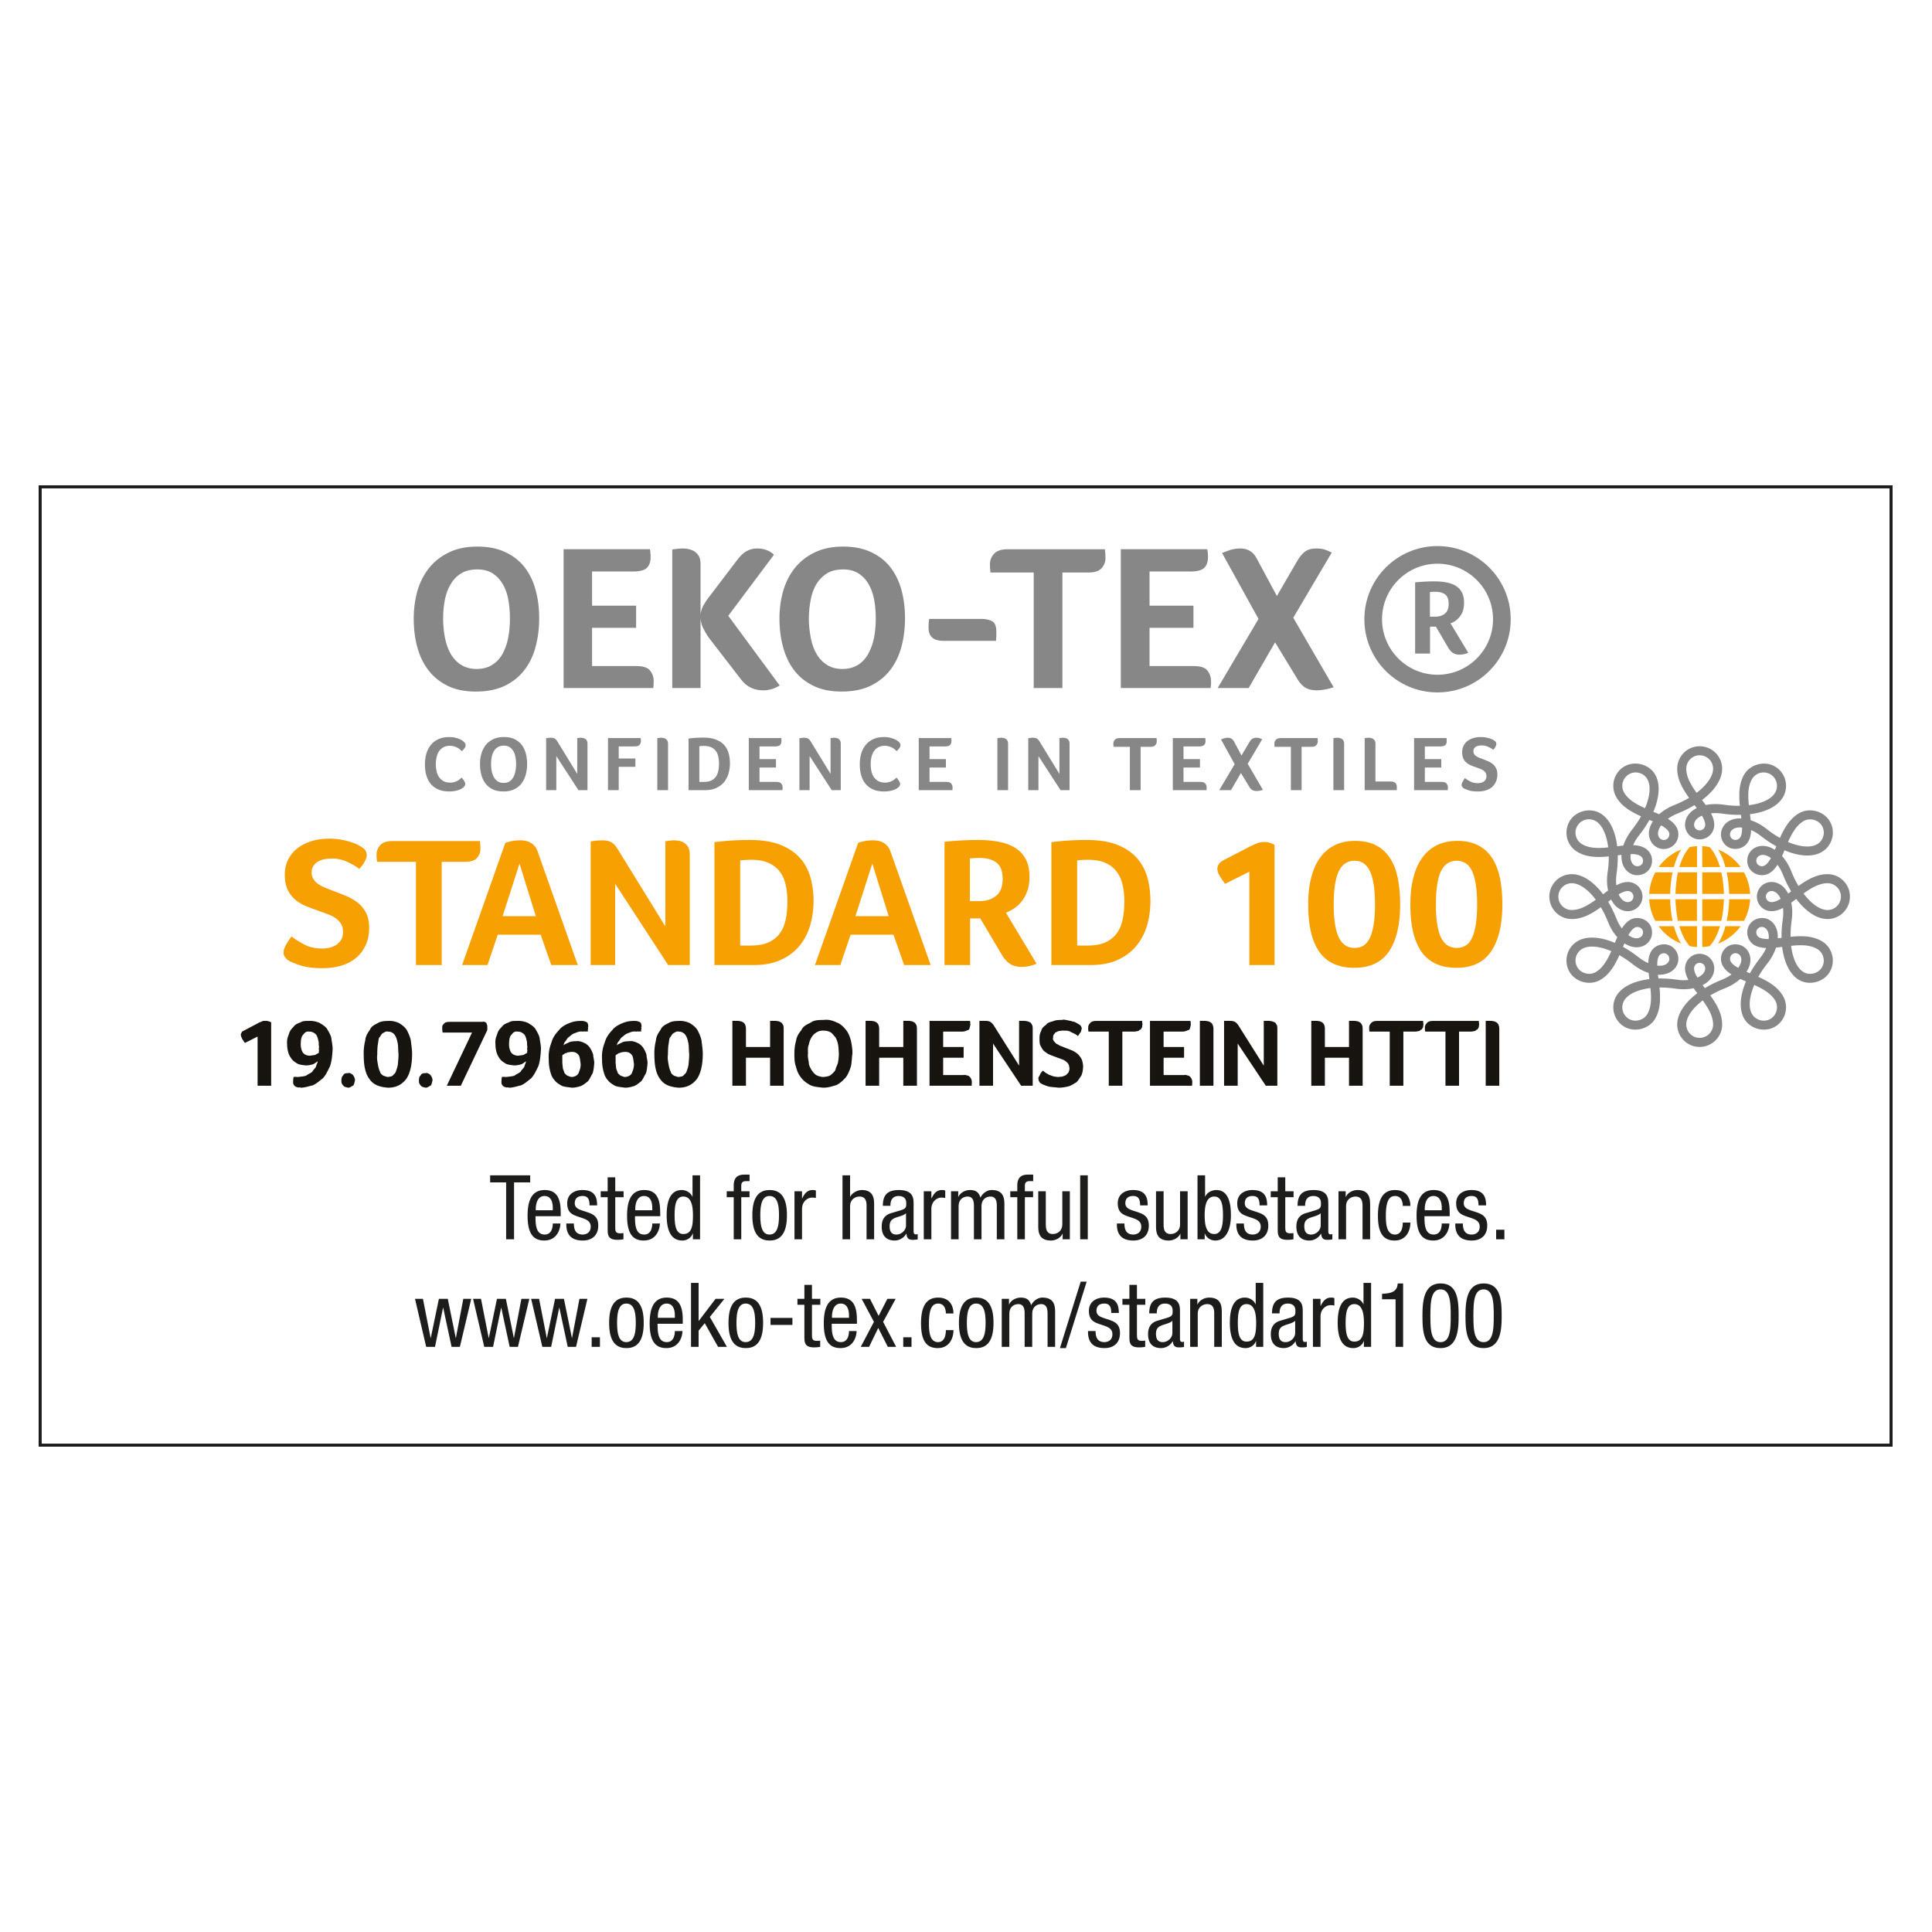 Sac en cotton Oeko-Tex STANDARD 100 à anses longues